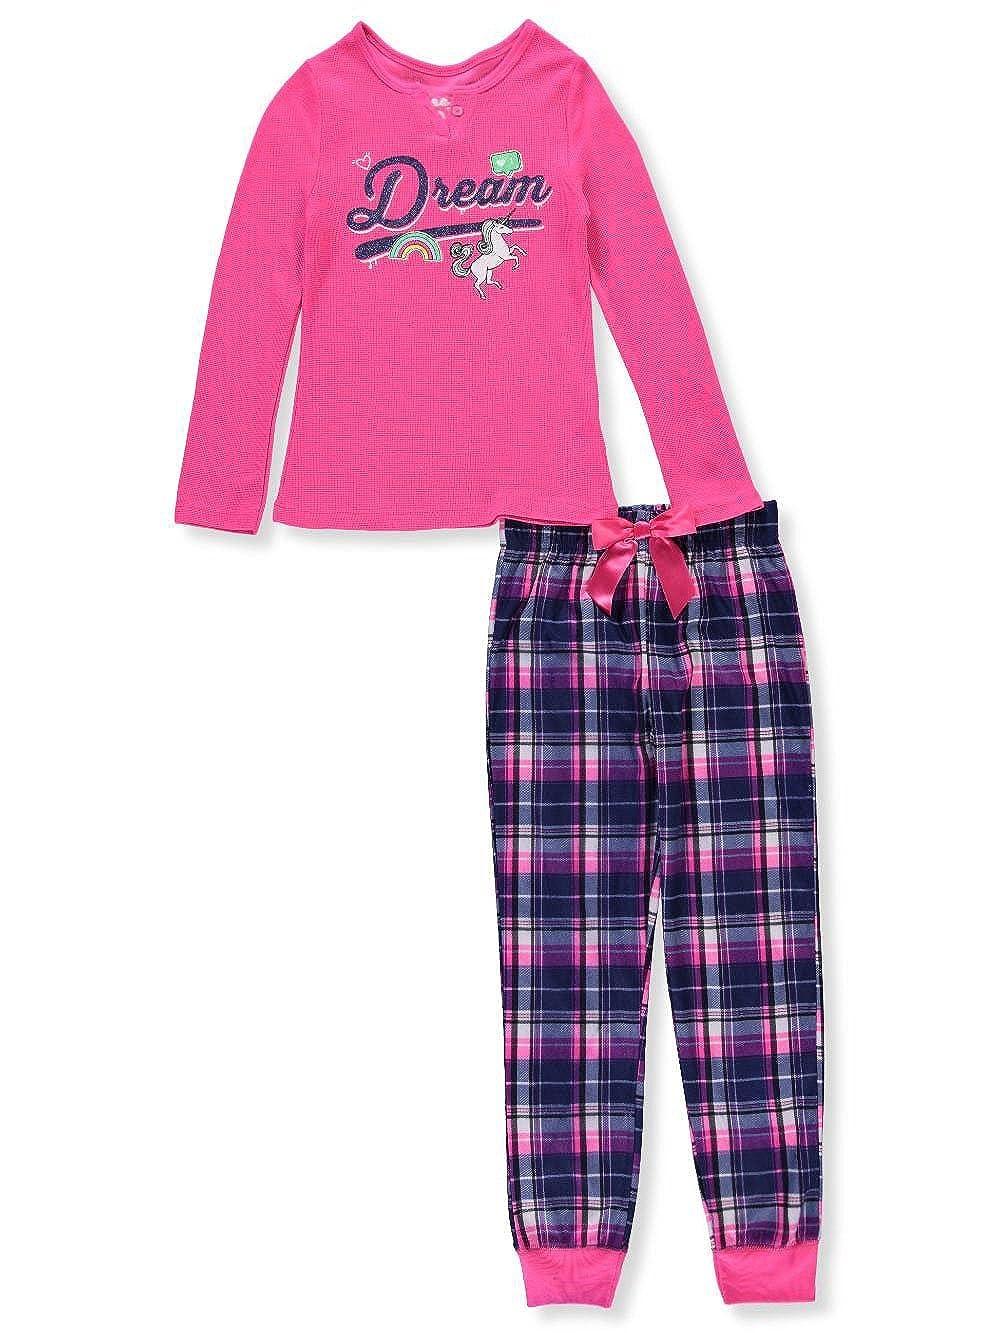 Sleep On It Girls' 2-Piece Pajama Pants Set